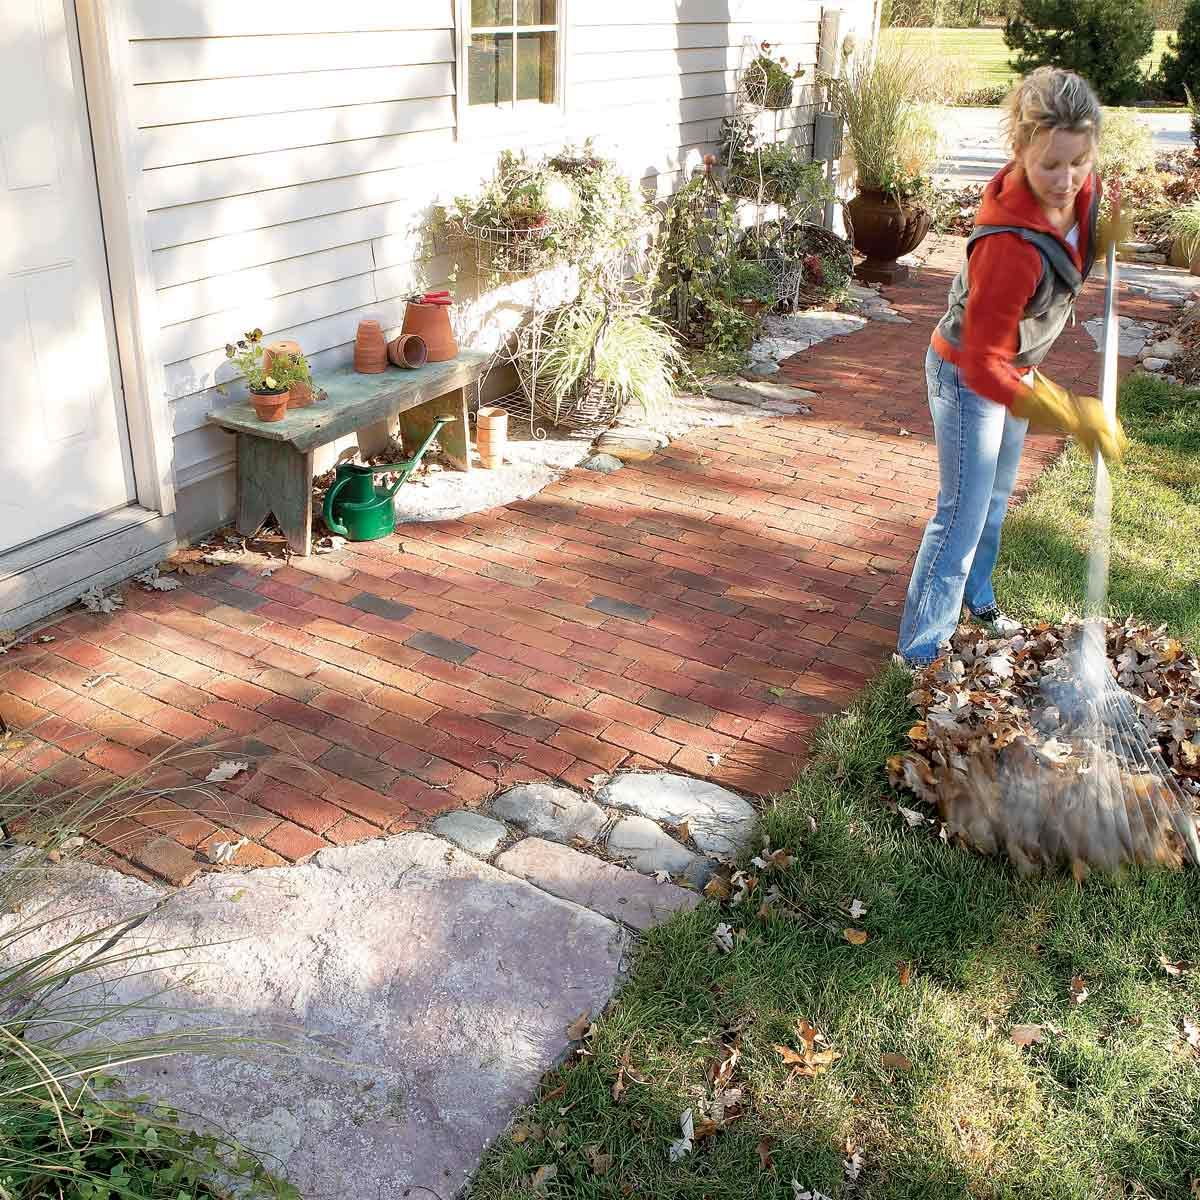 How To Build Pathways Brick And Stone Pathways Backyard Makeover Stone Pathway Brick And Stone